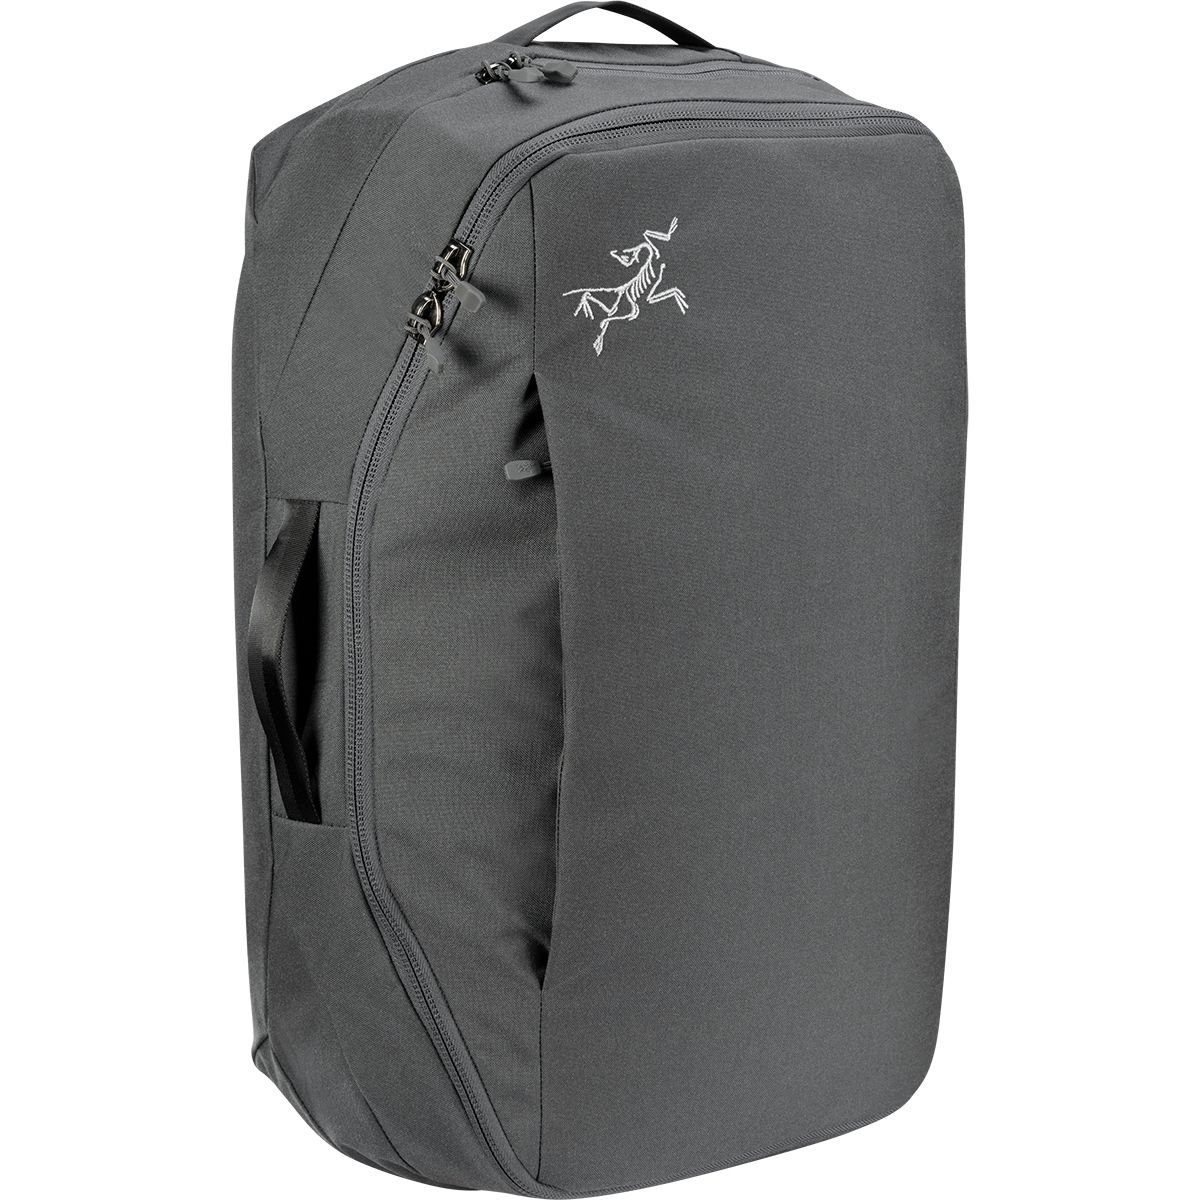 Arc'teryx Unisex Covert Case C/O Pilot One Size